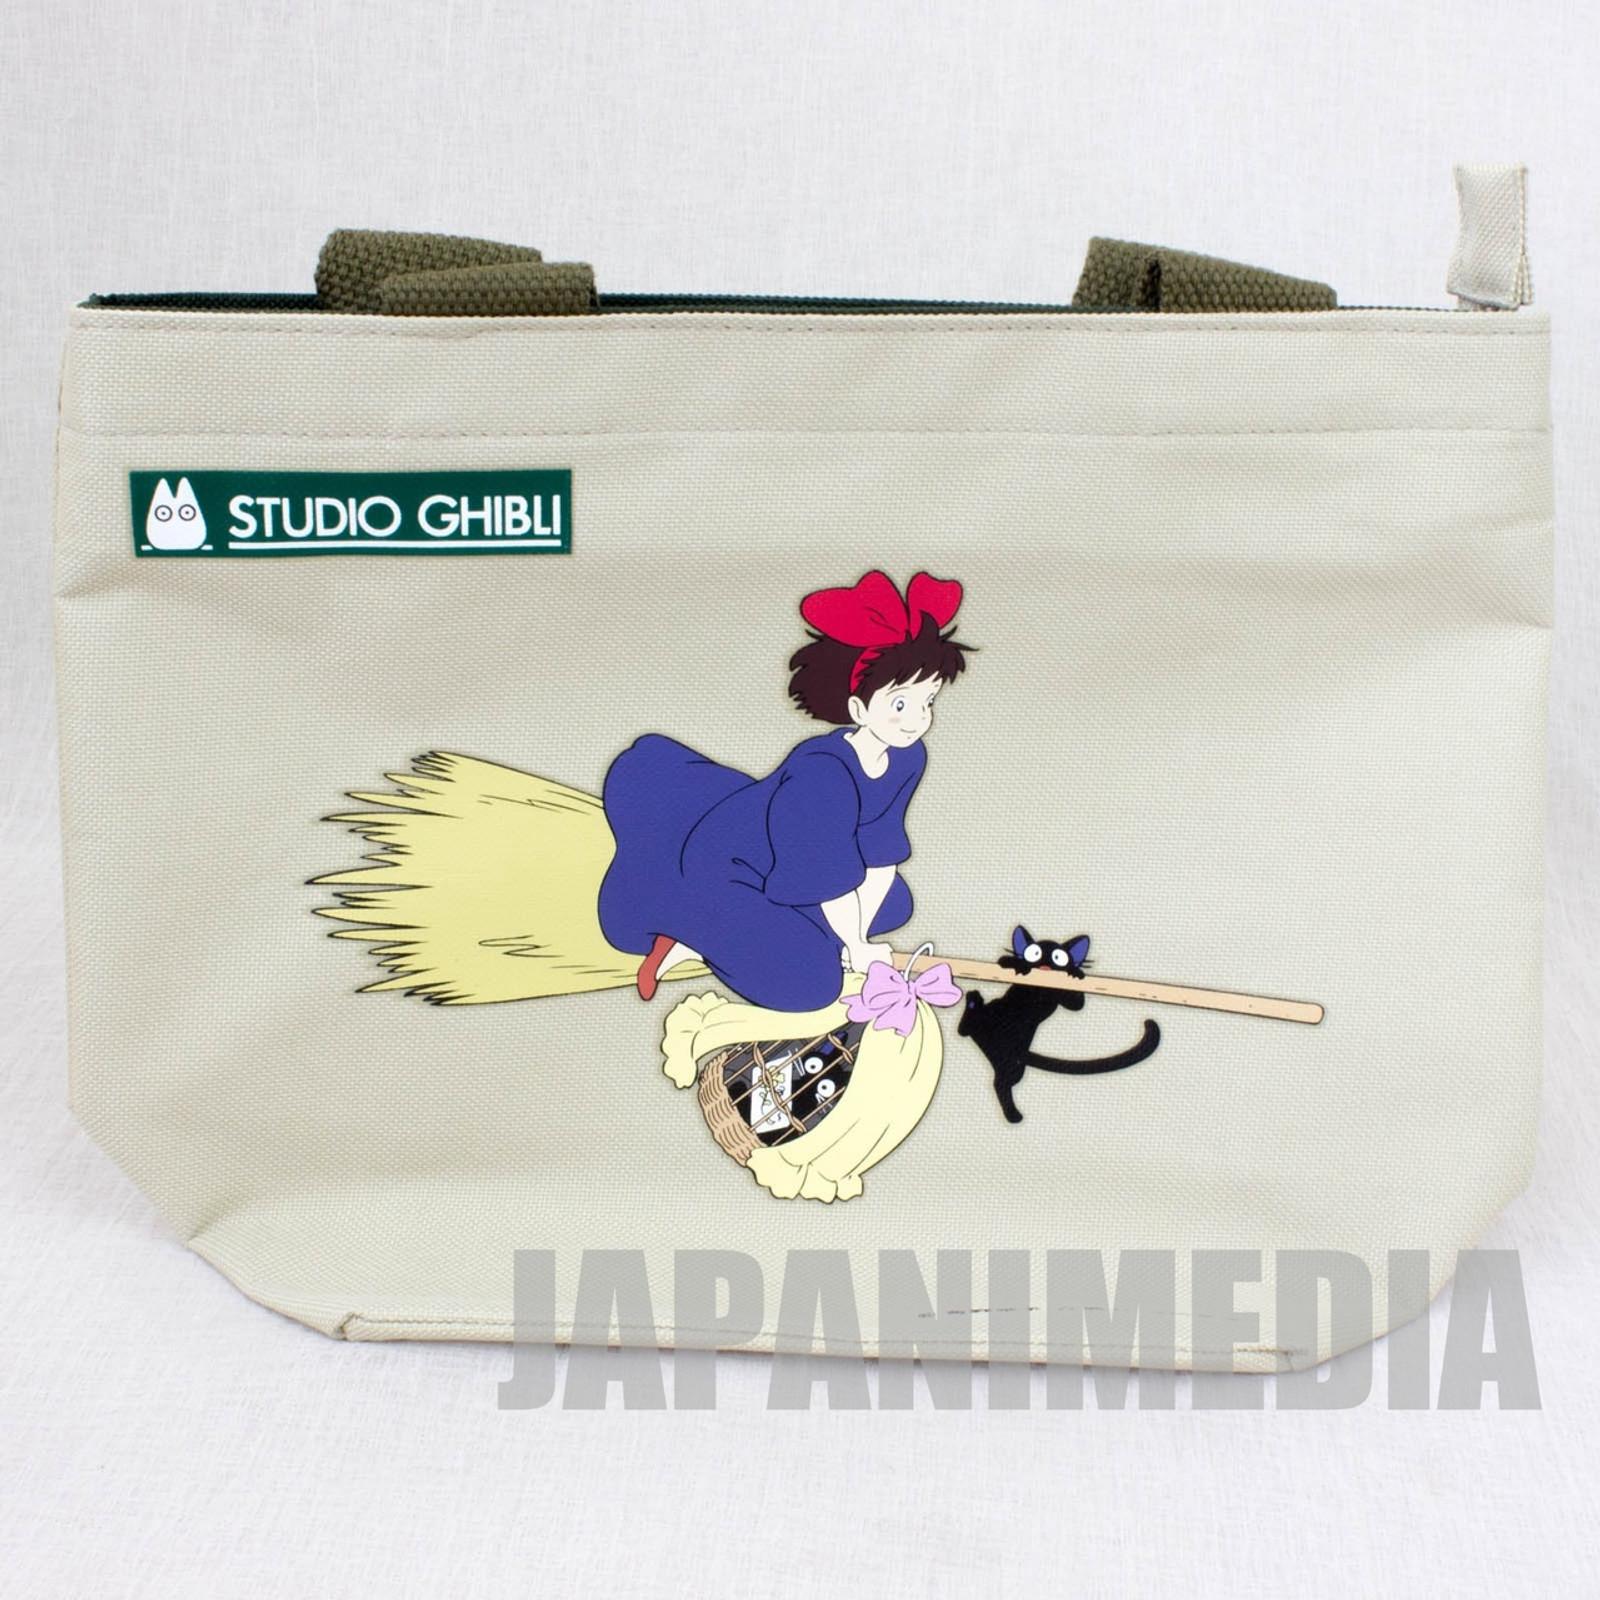 Kiki's Delivery Service Tote Bag H23 x W30cm Studio Ghibli JAPAN ANIME MANGA